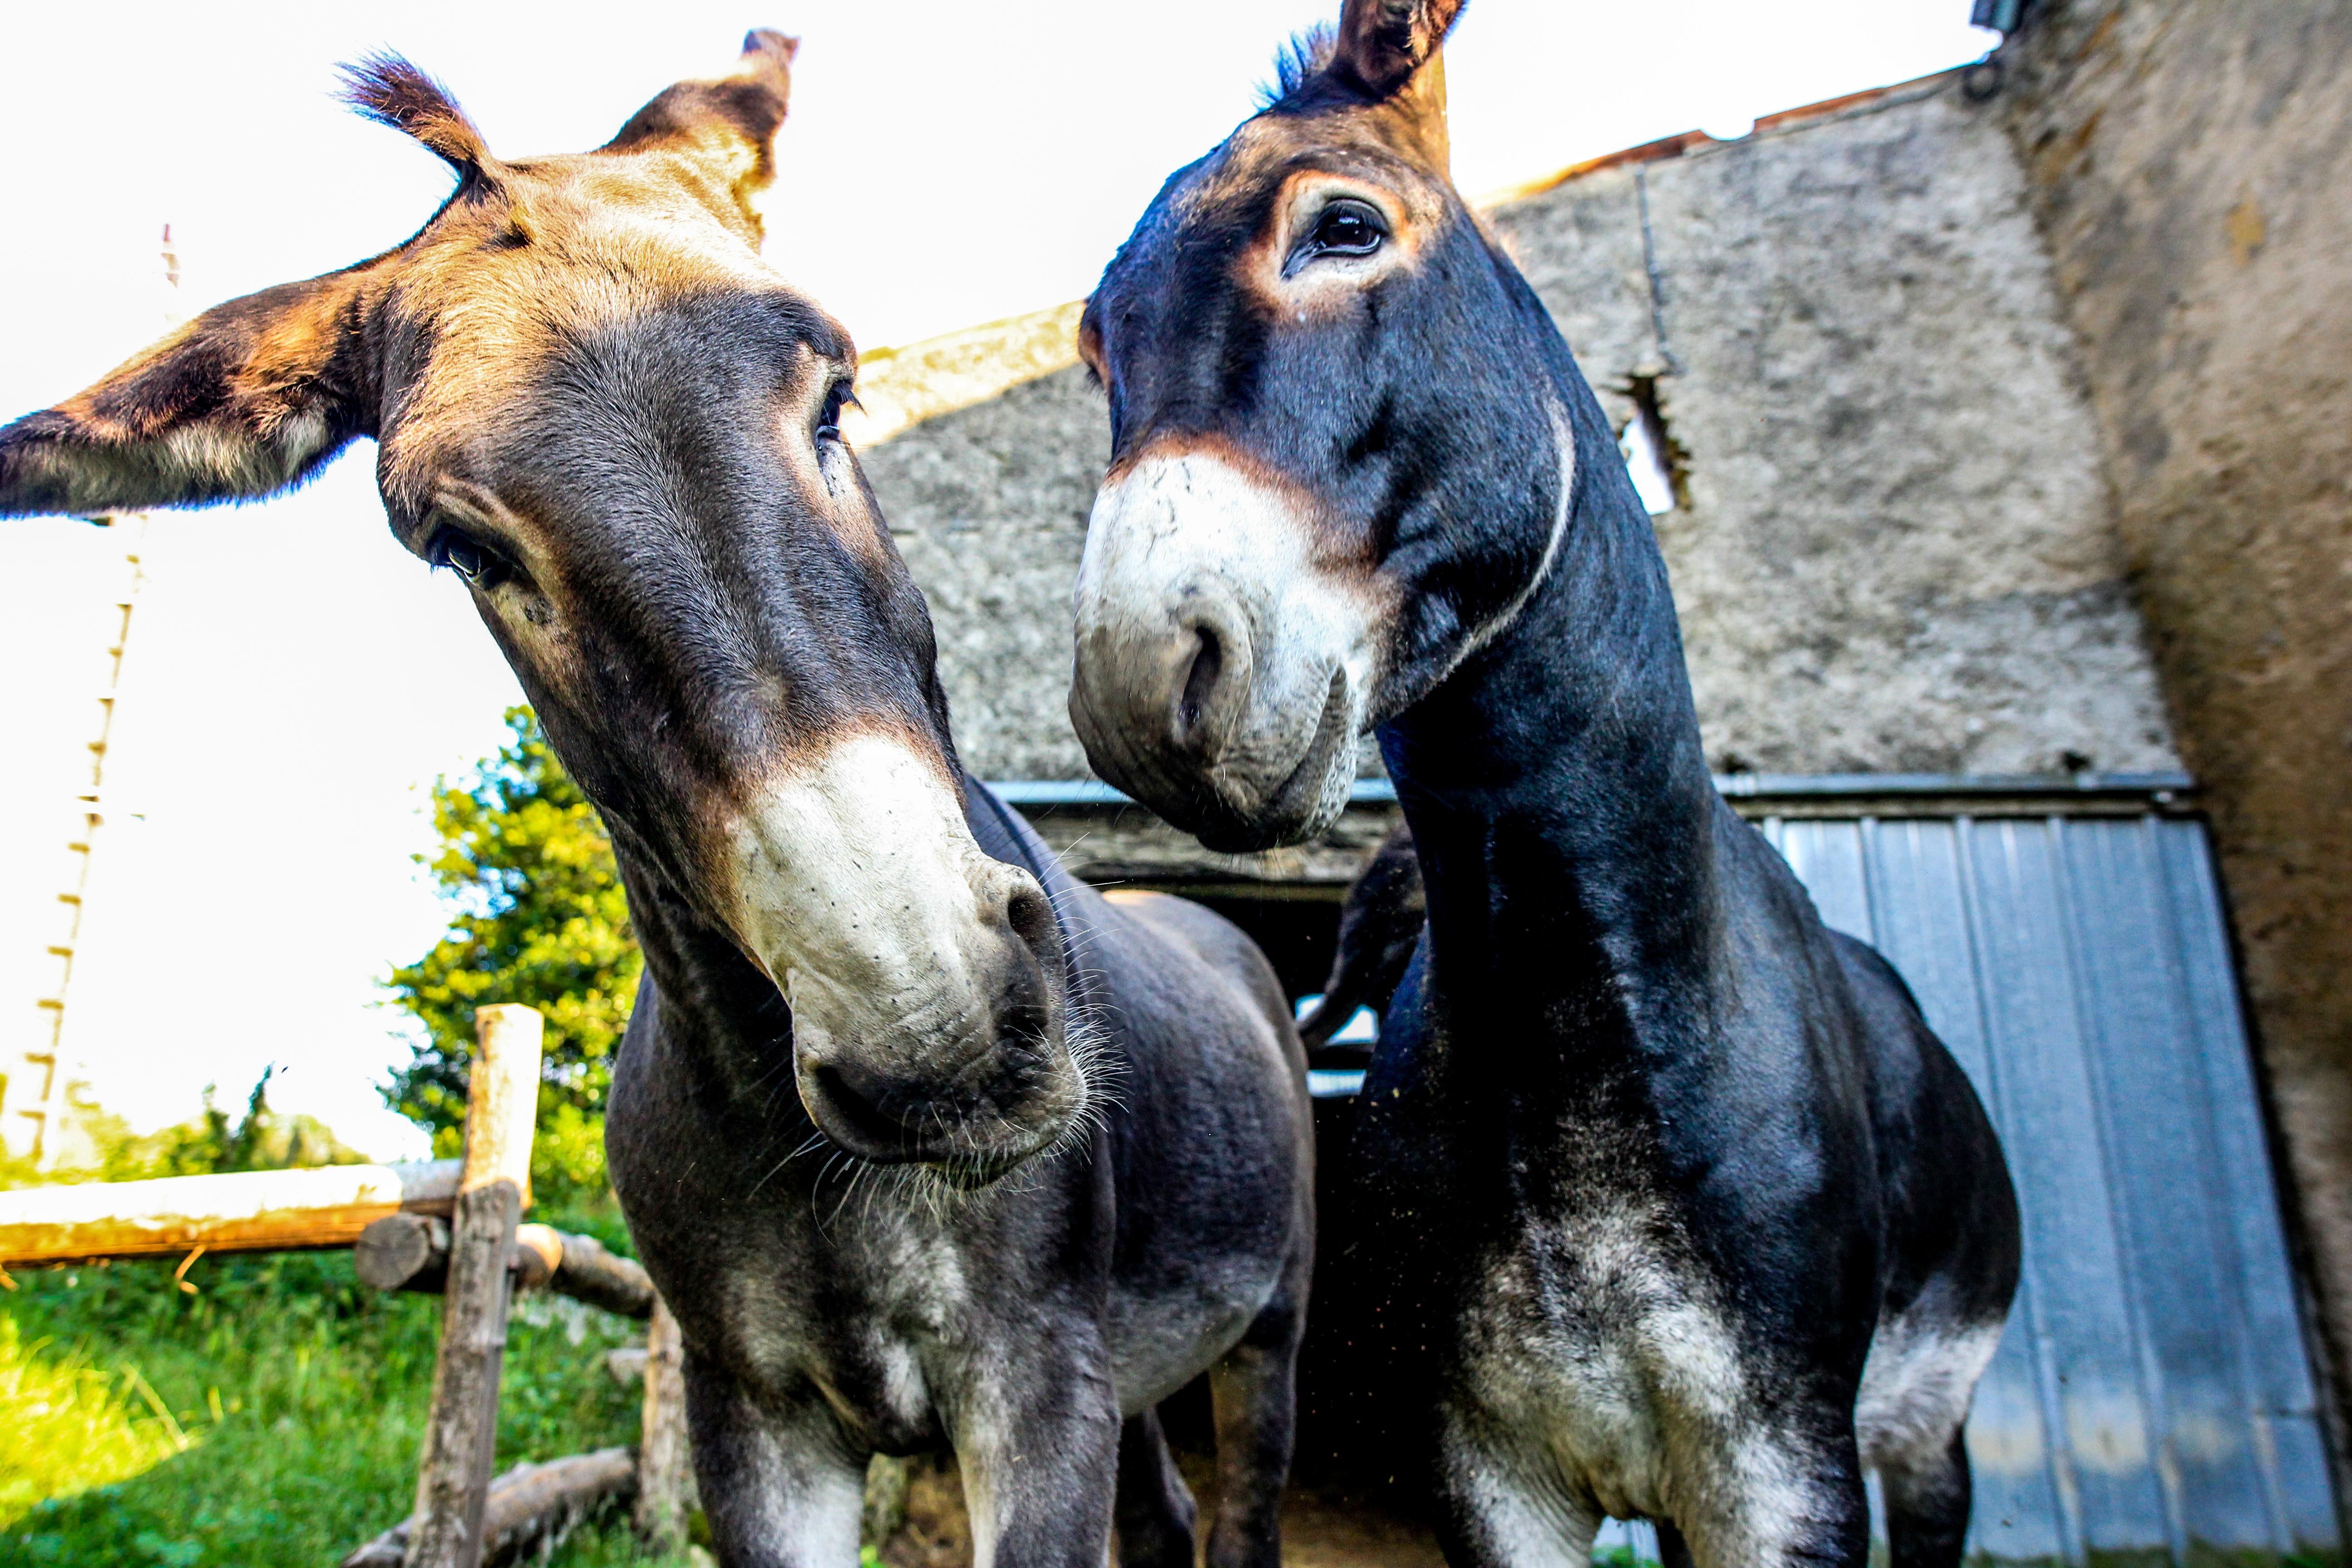 Donkey (Montagne Noire, France)